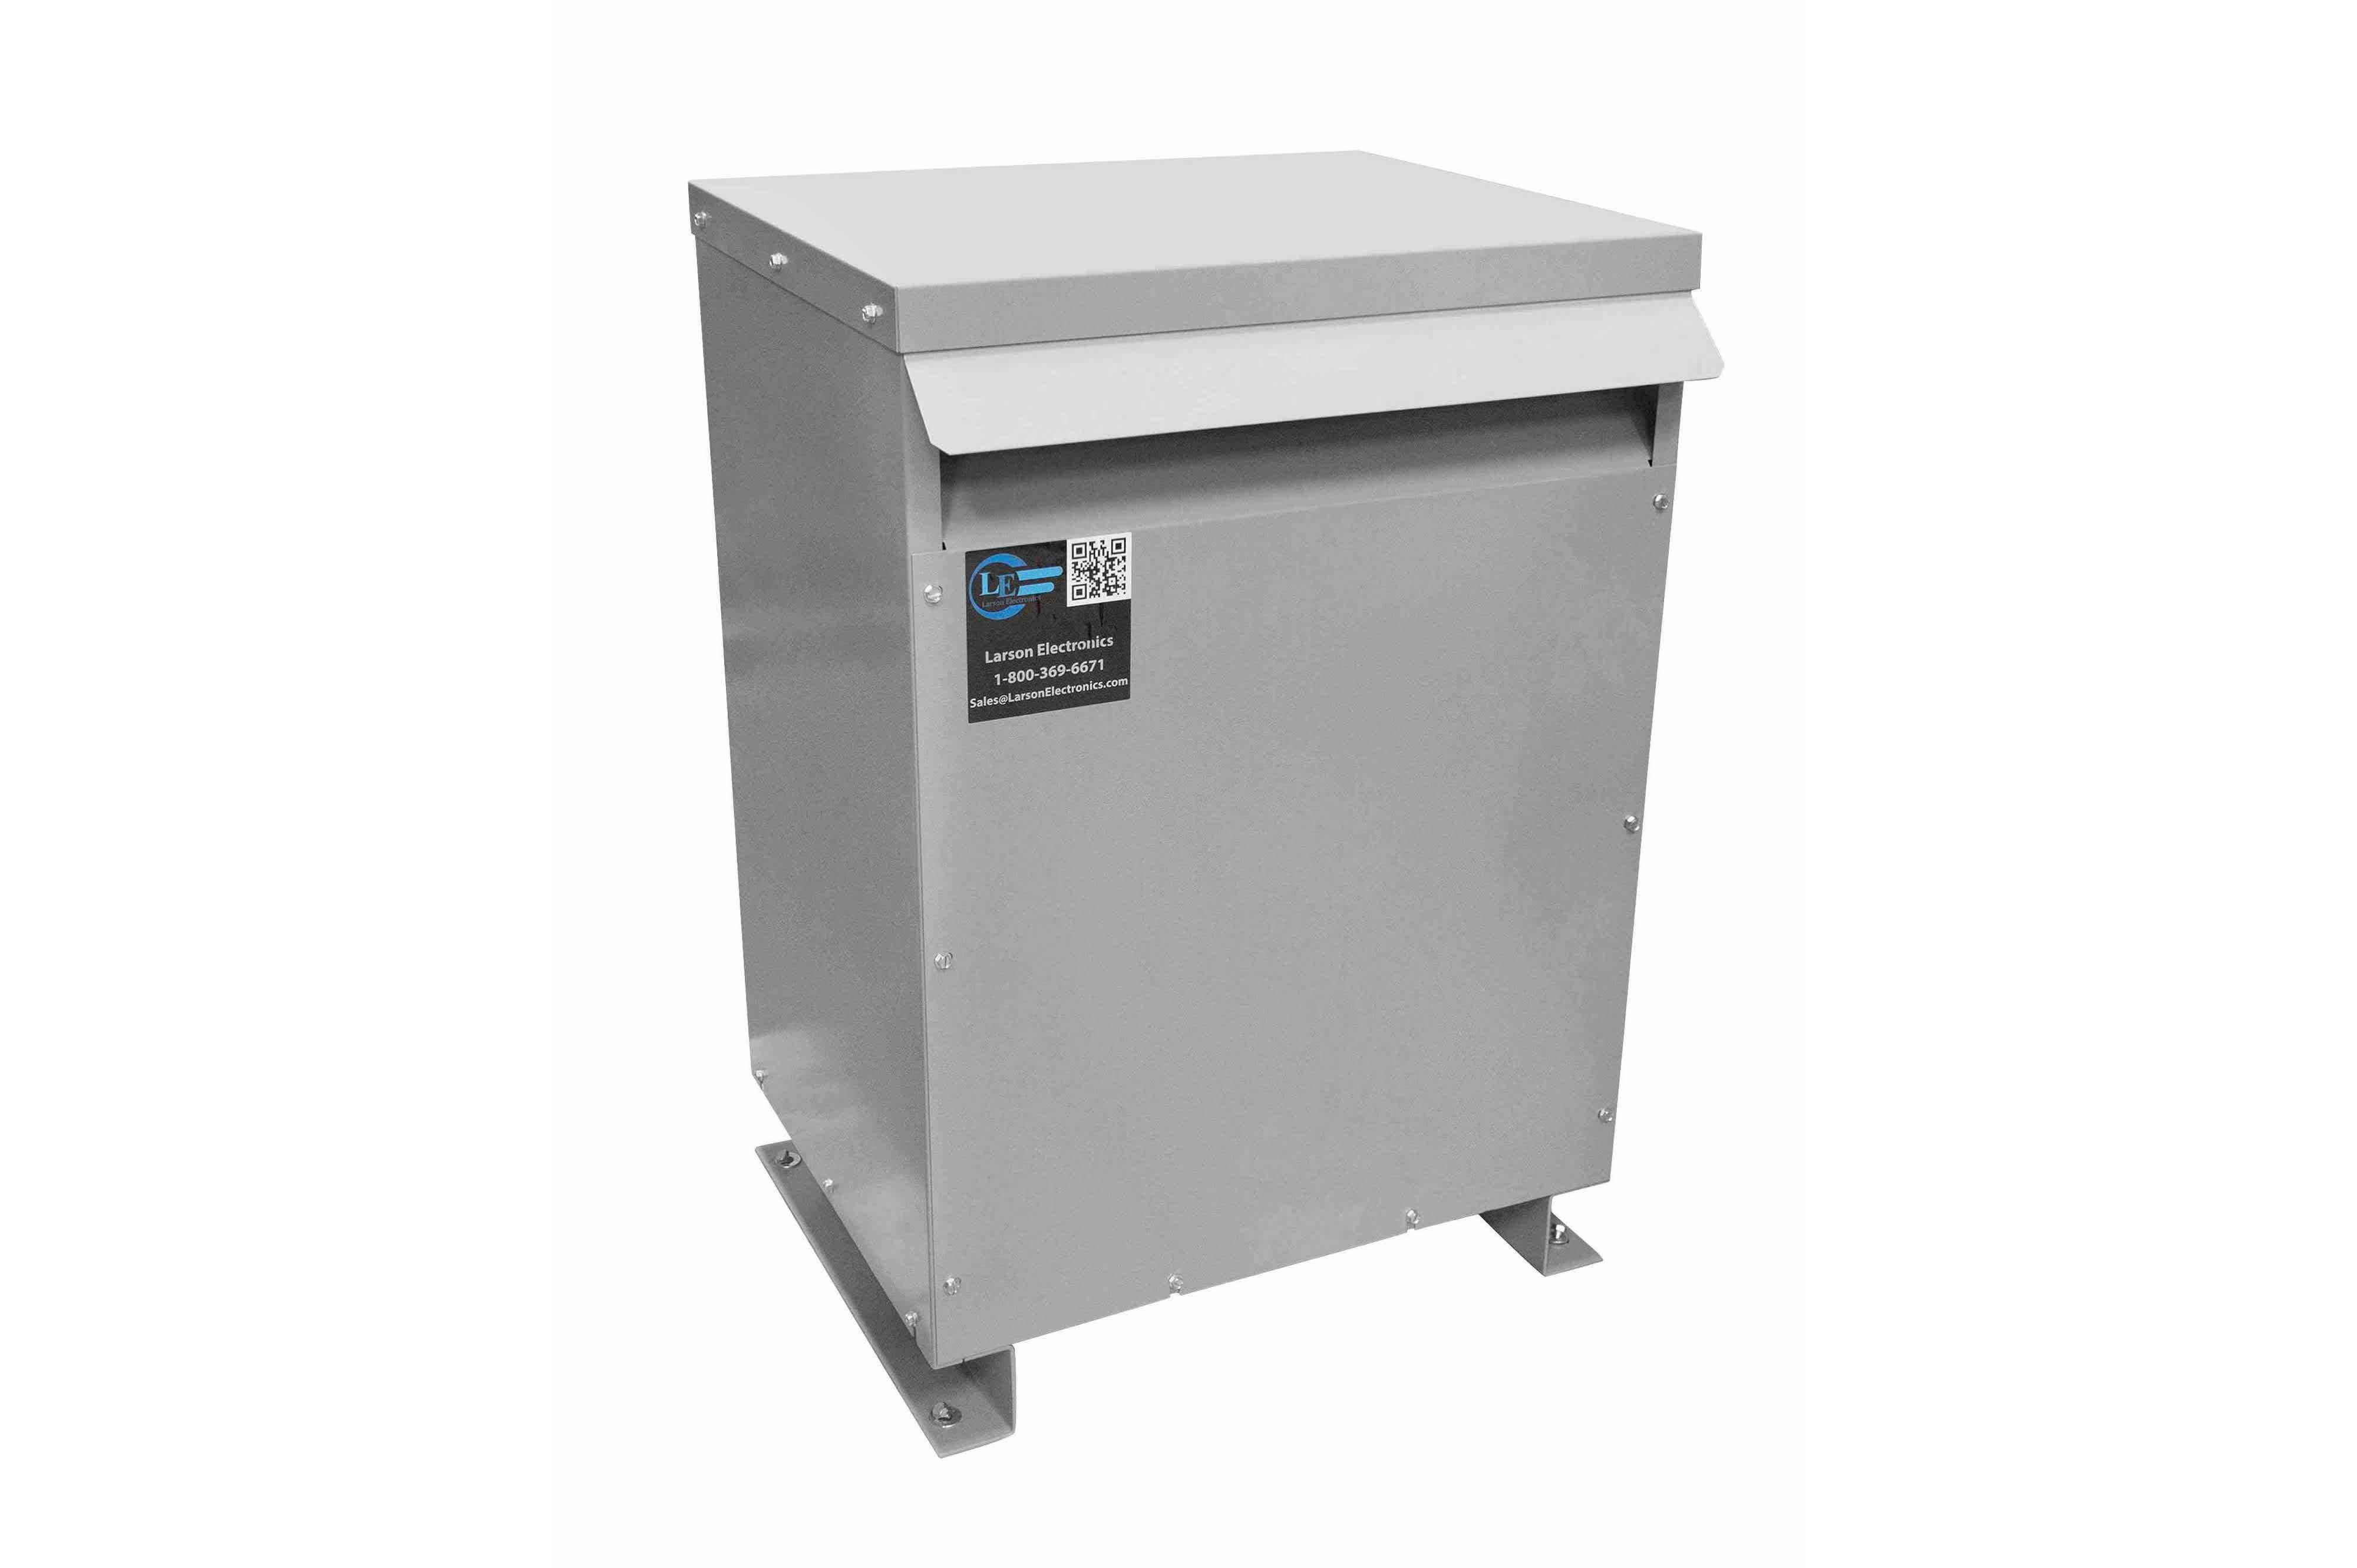 38 kVA 3PH Isolation Transformer, 230V Wye Primary, 208V Delta Secondary, N3R, Ventilated, 60 Hz